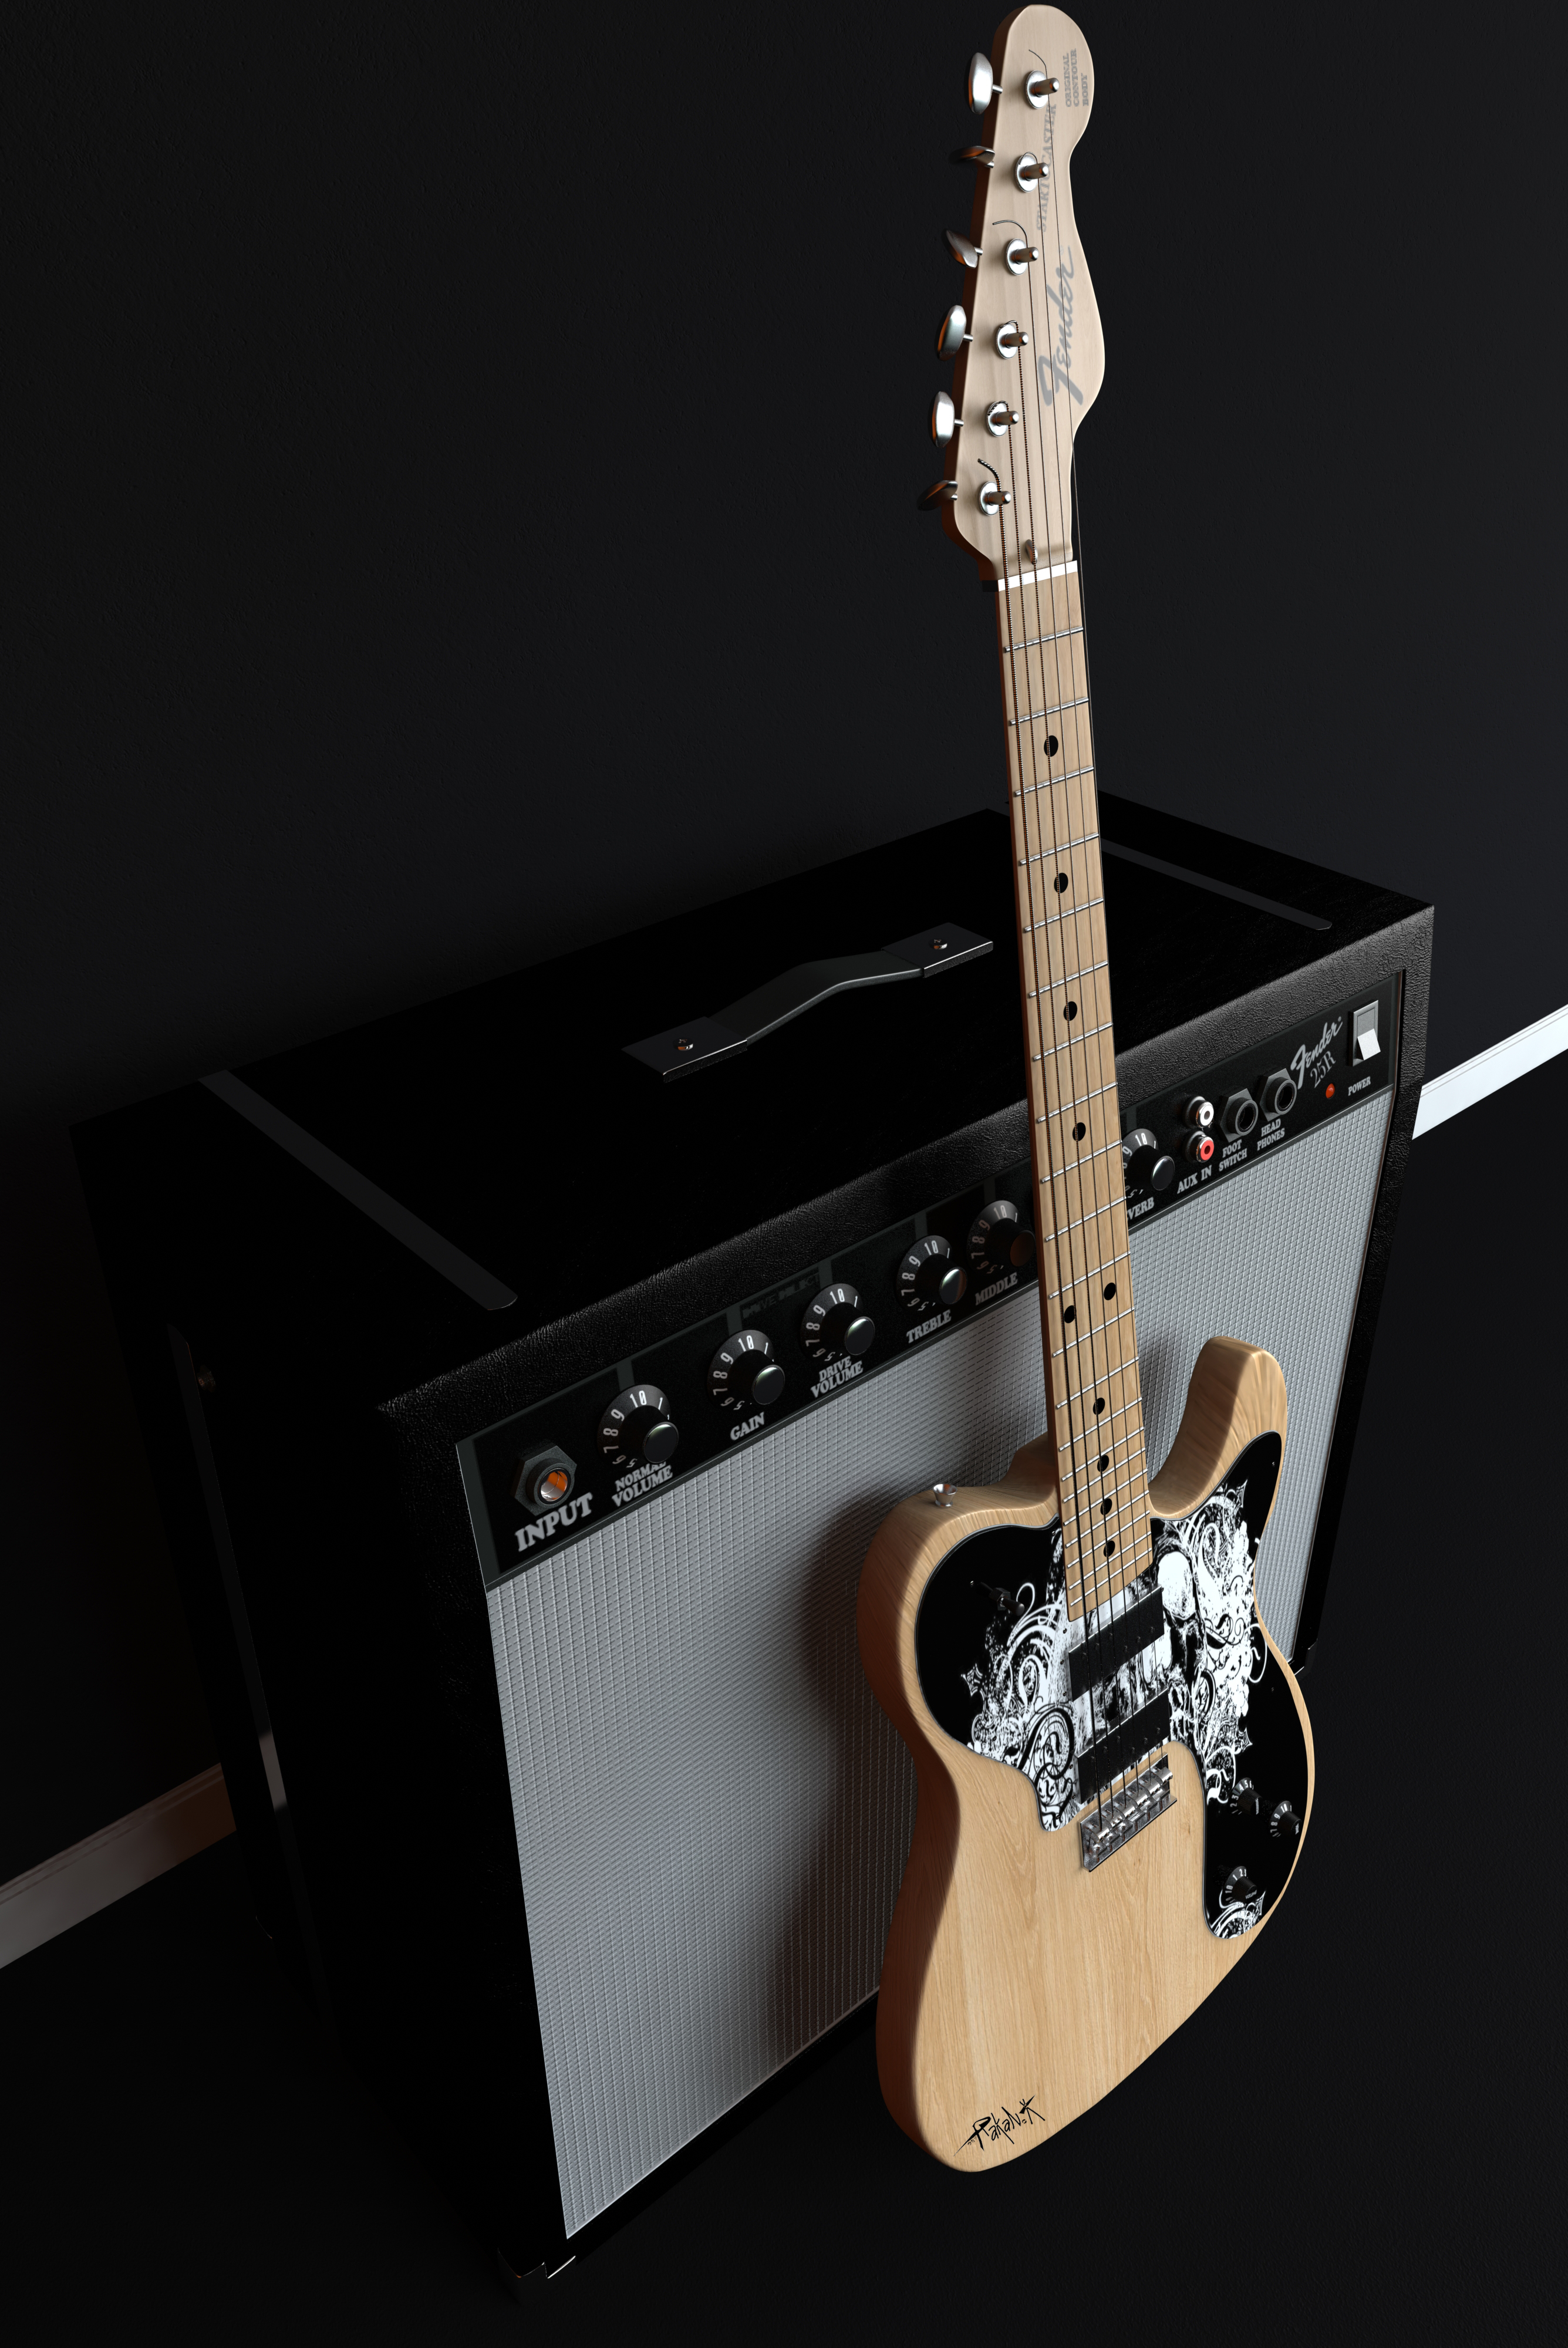 Wallpaper Fender Guitar Wallpaper Iphone 2671x4000 Wallpaper Teahub Io